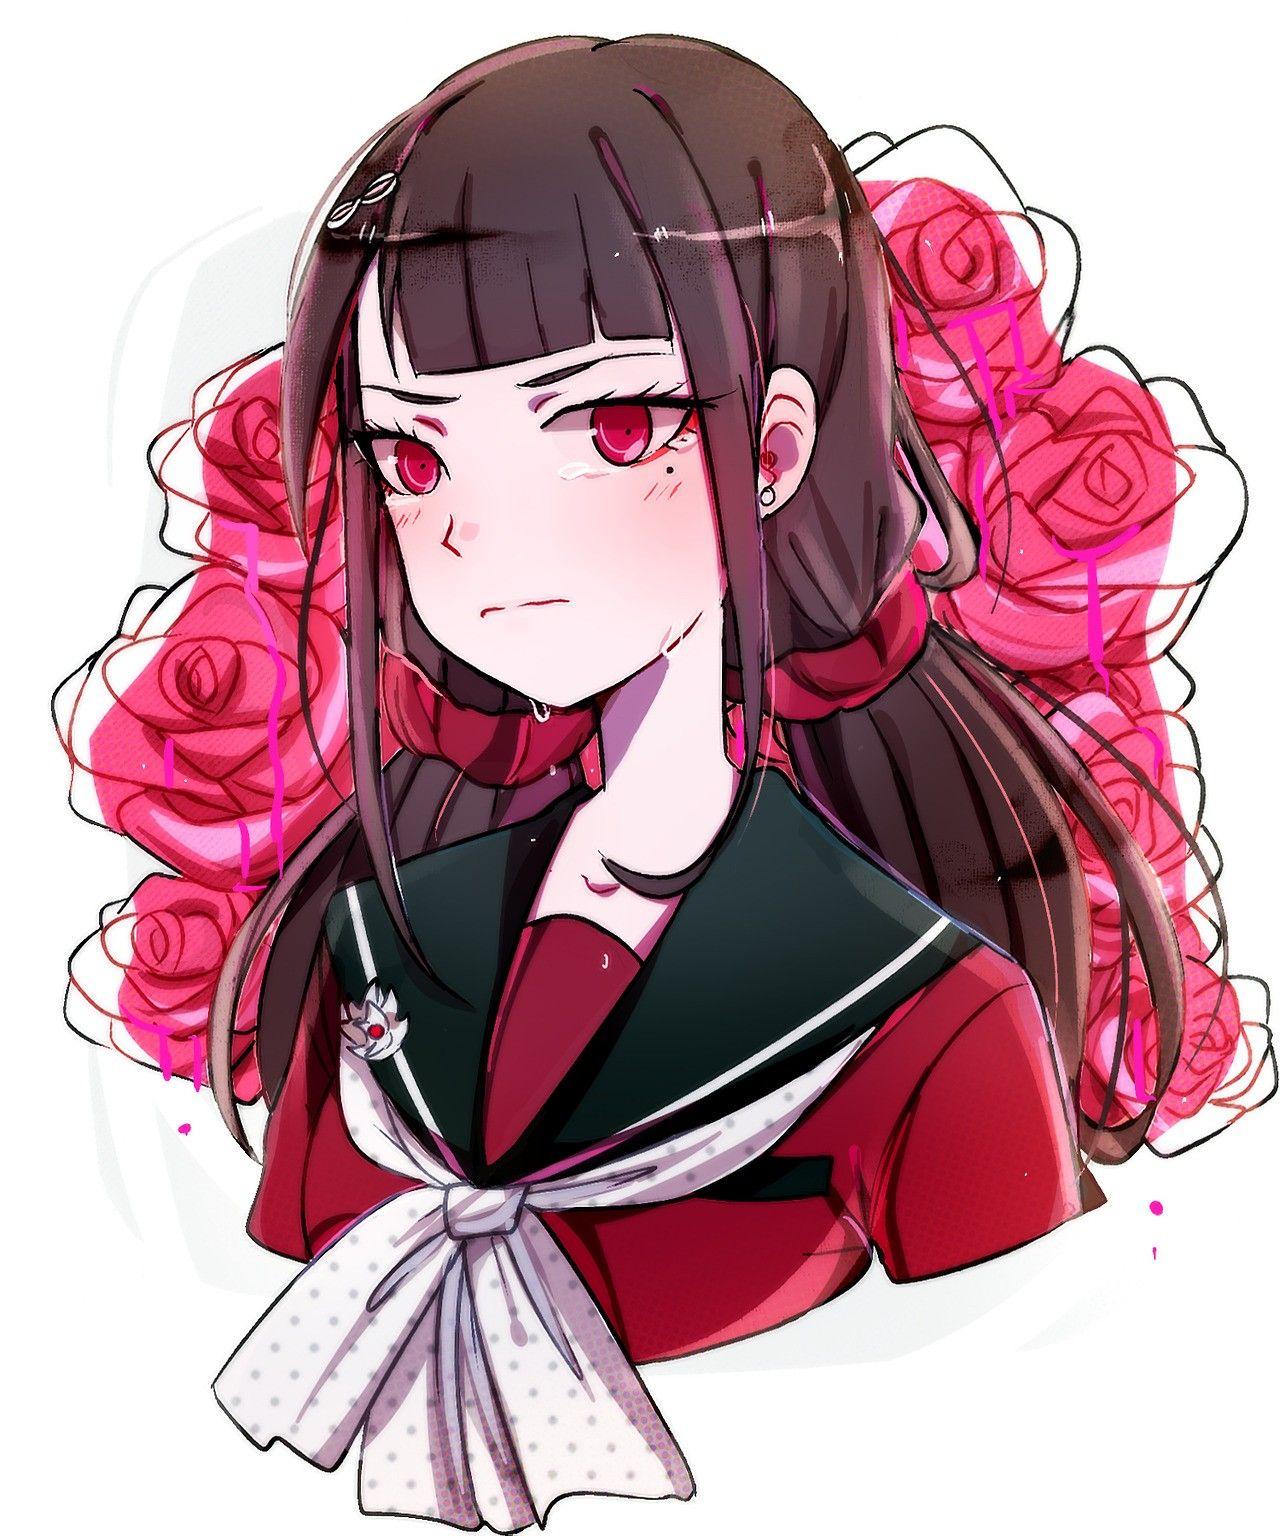 Pin By Meri Malaikat On Anime Danganronpa Anime Trigger Happy Havoc